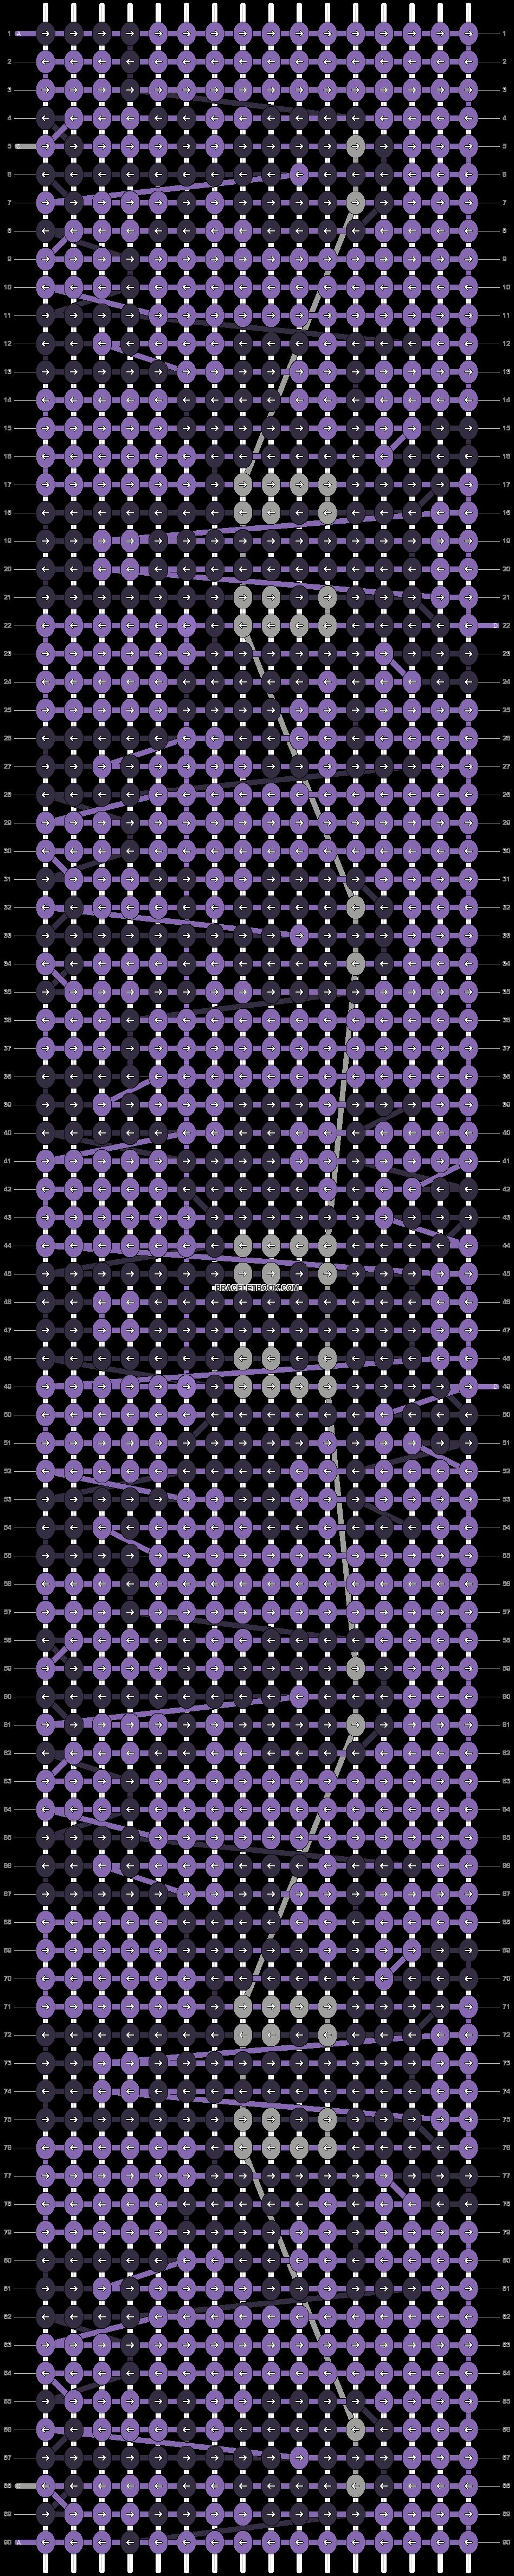 Alpha Pattern #21325 added by razcarate